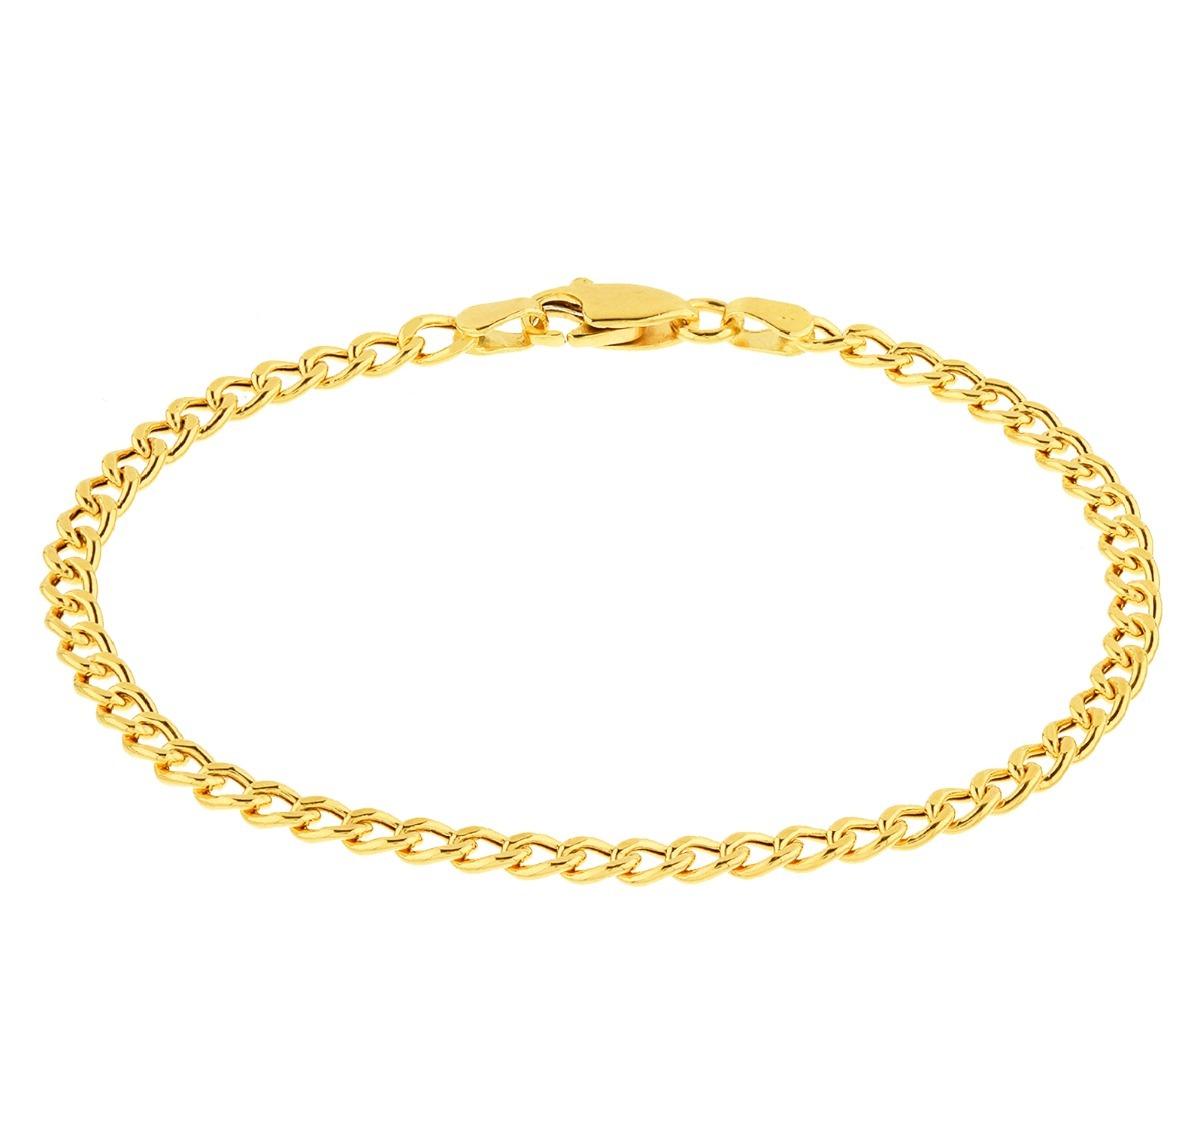 ccb2deba620 pulseira de ouro 18k infantil masculina - malha grumet. Carregando zoom.